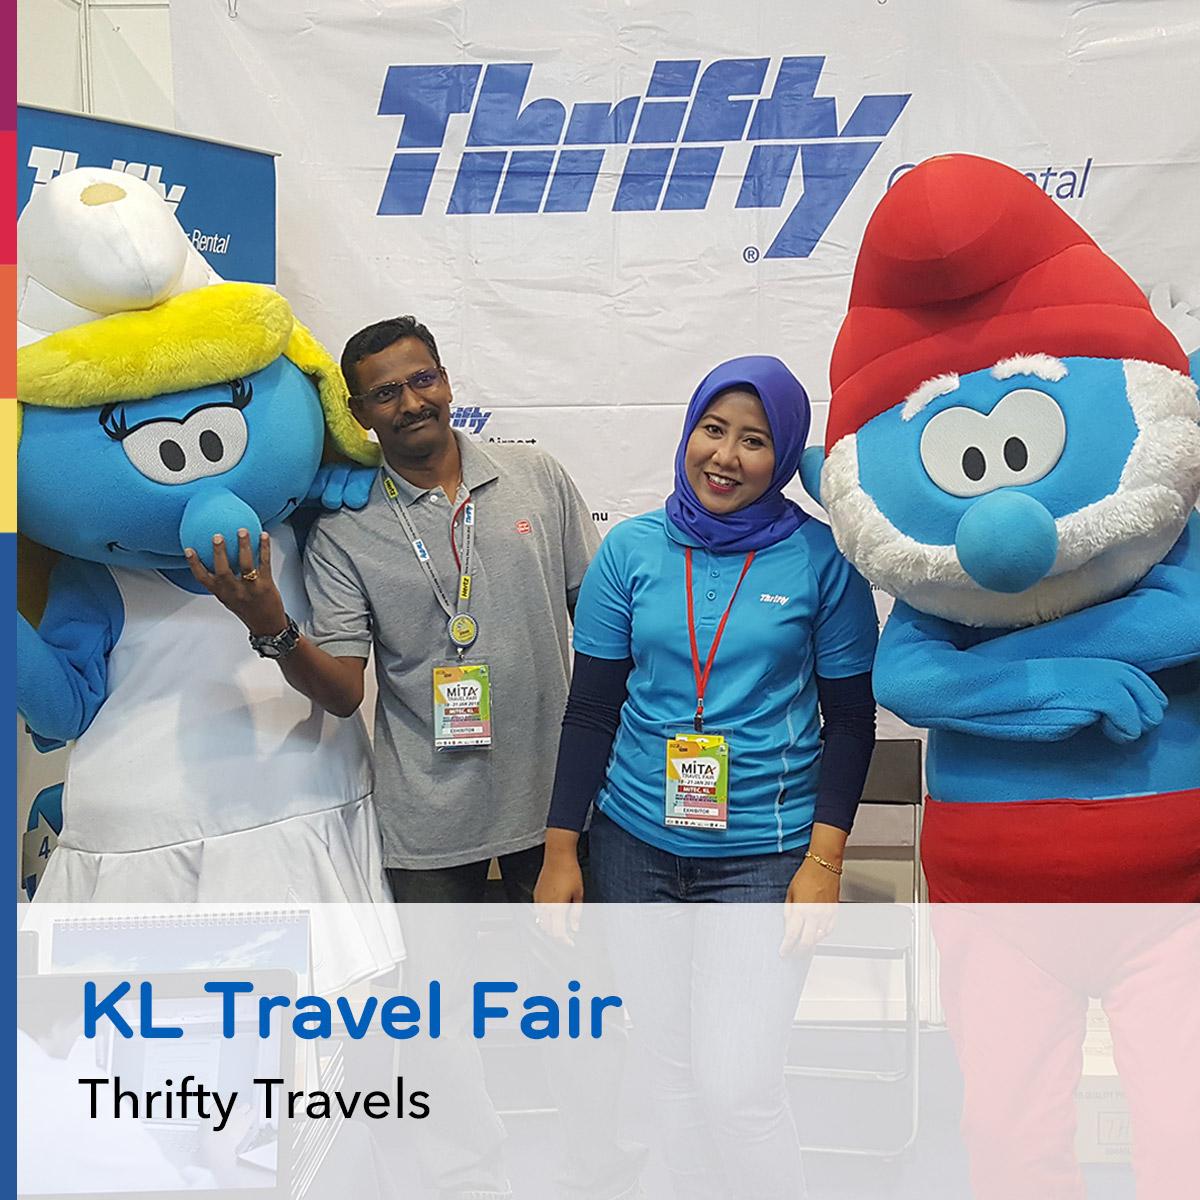 KL Travel Fair 2018